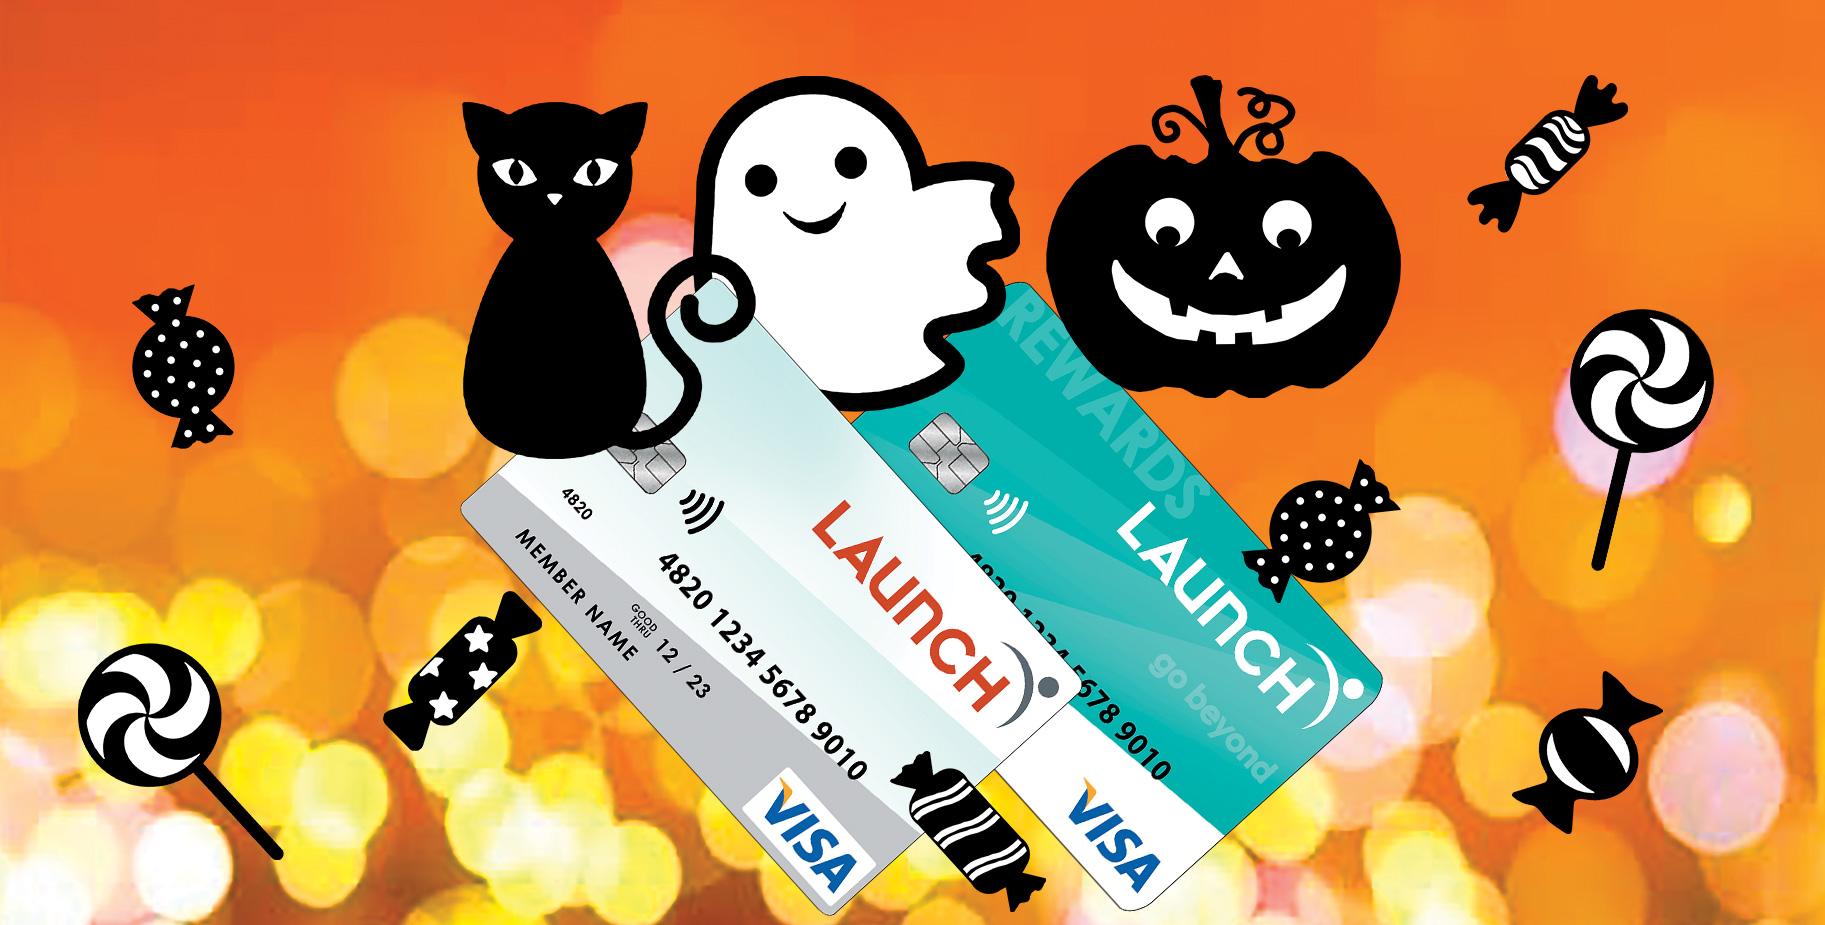 Special New Cardholder Offer